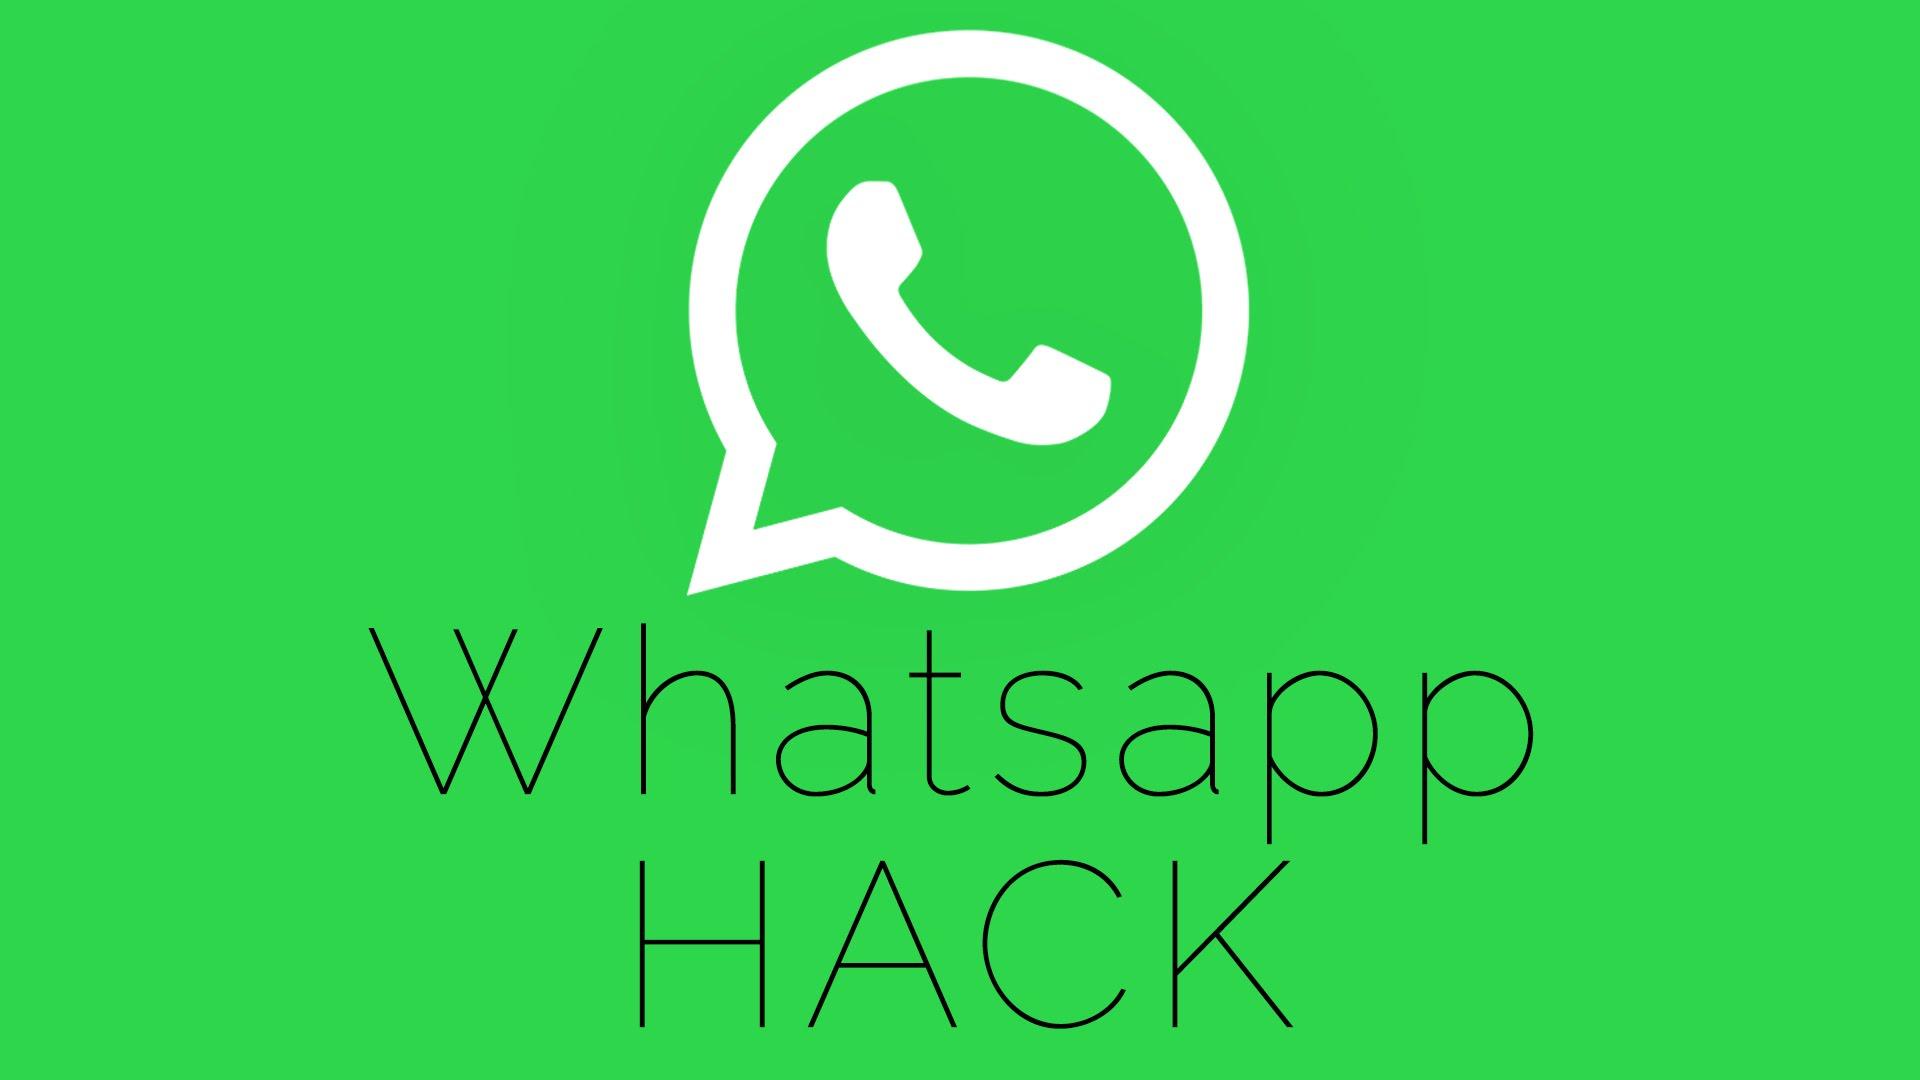 whatsapp hacked version without jailbreak iPhone watusi